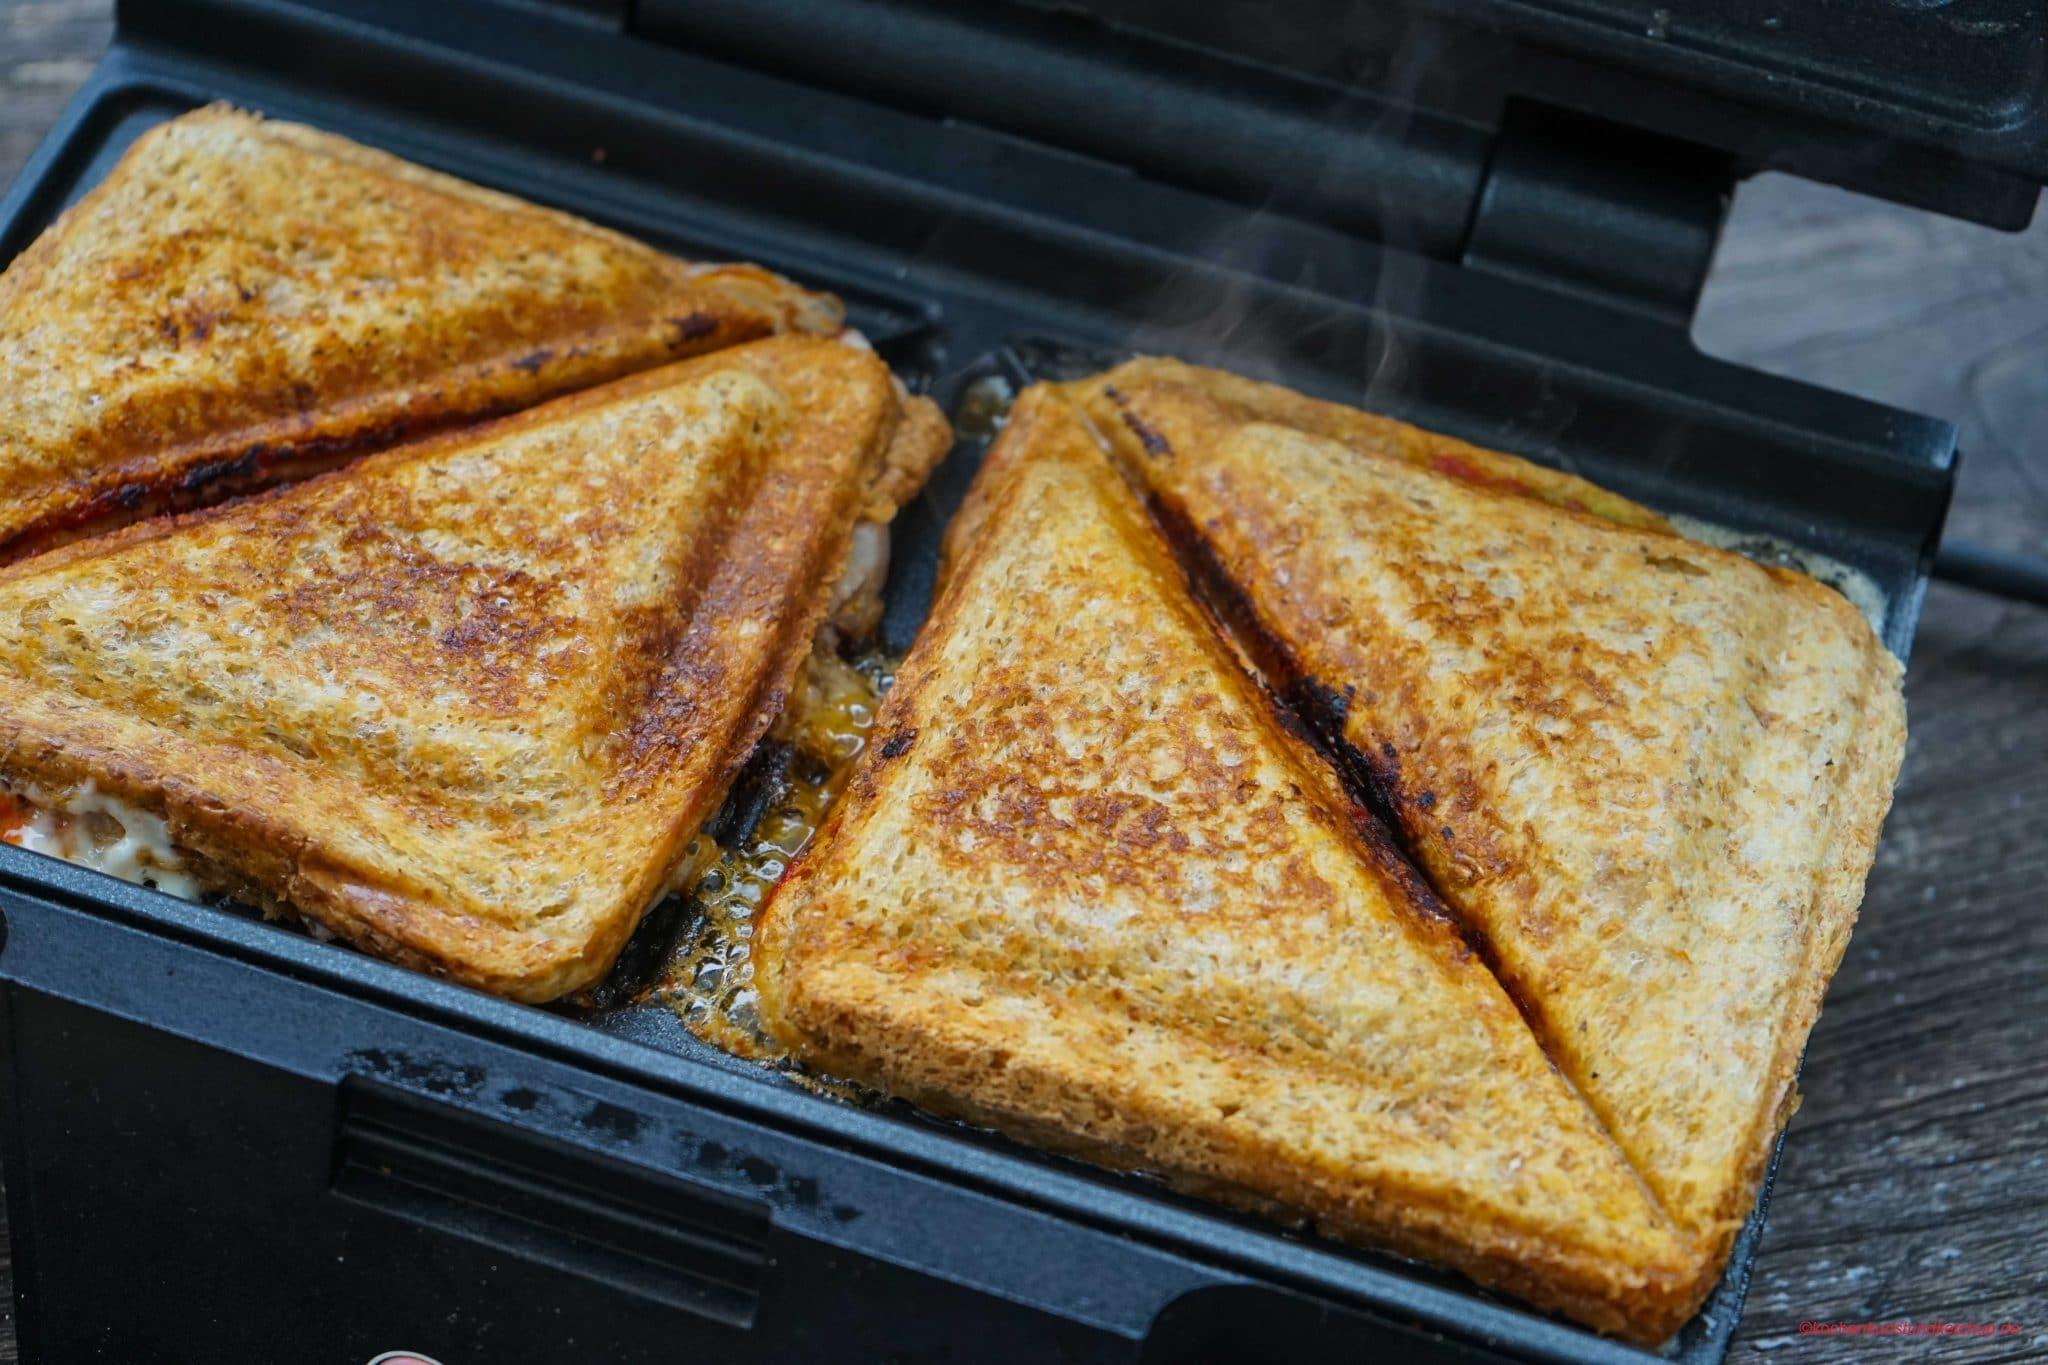 bester sandwichmaker sandwichtoaster alles  man